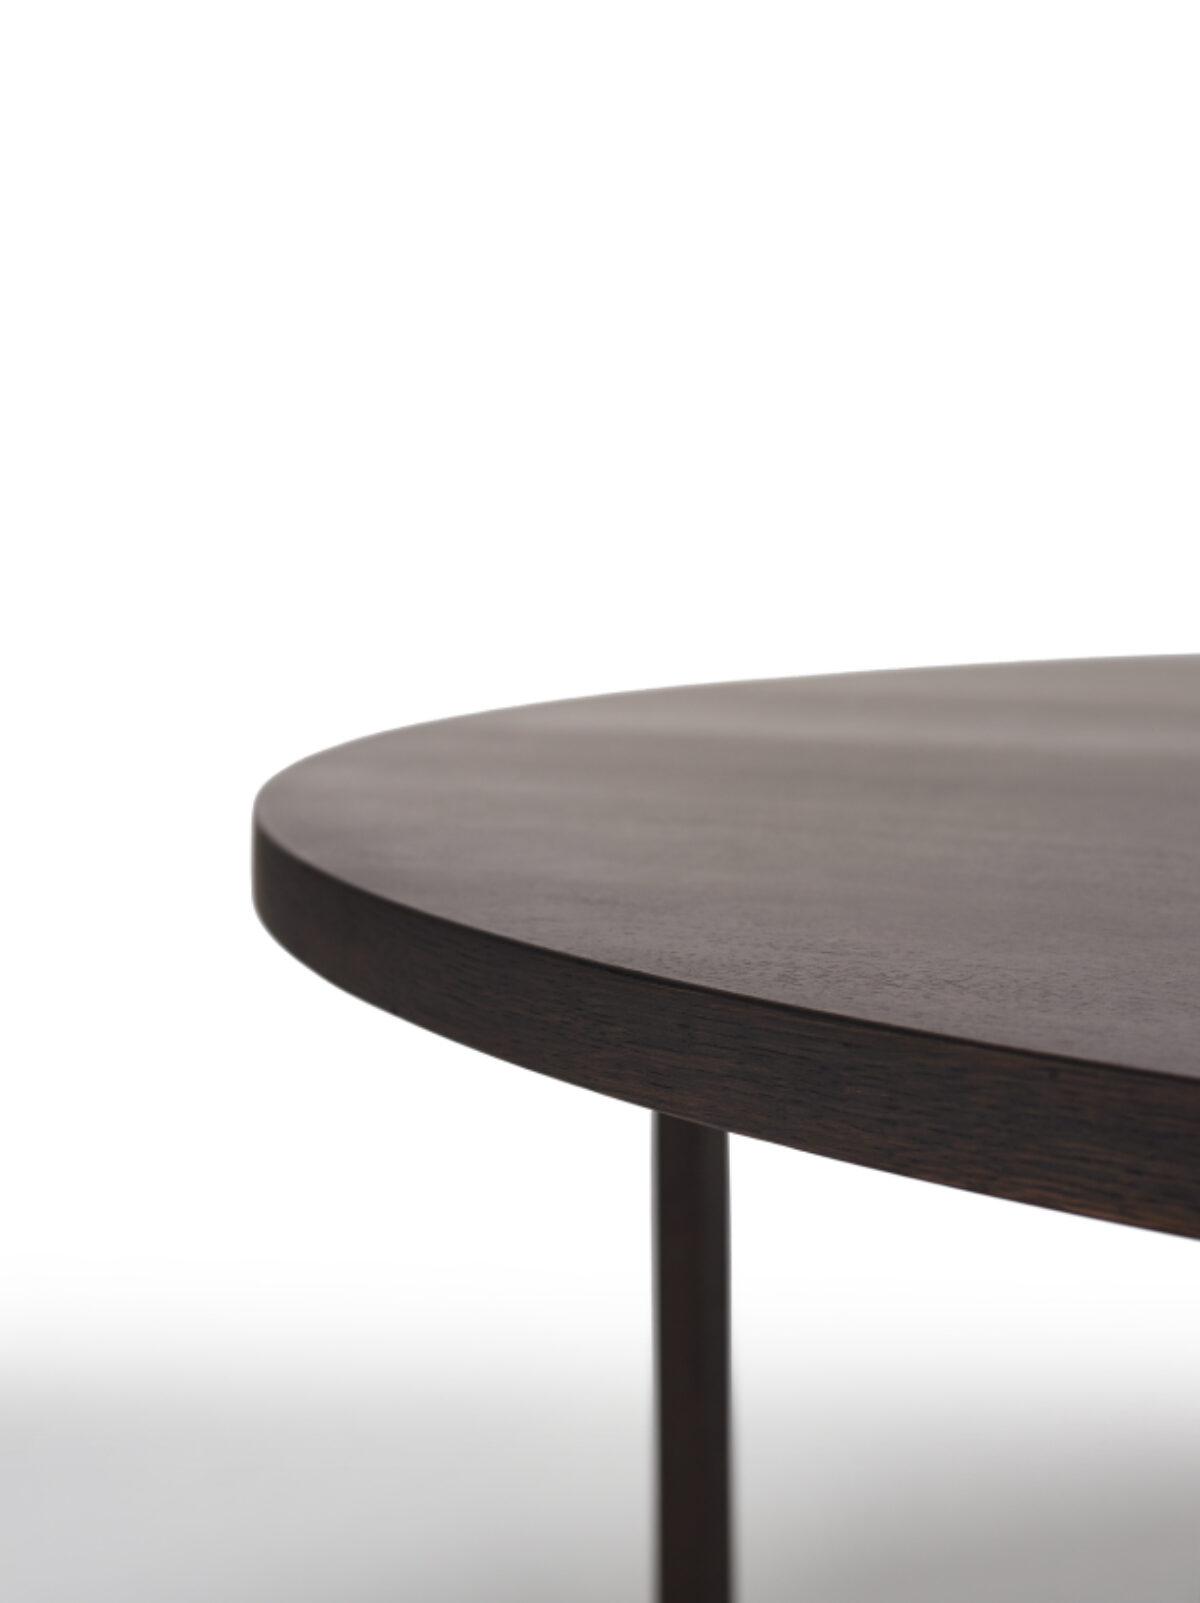 Arco Slim Plus Round Bertjan Pot Low Res 06